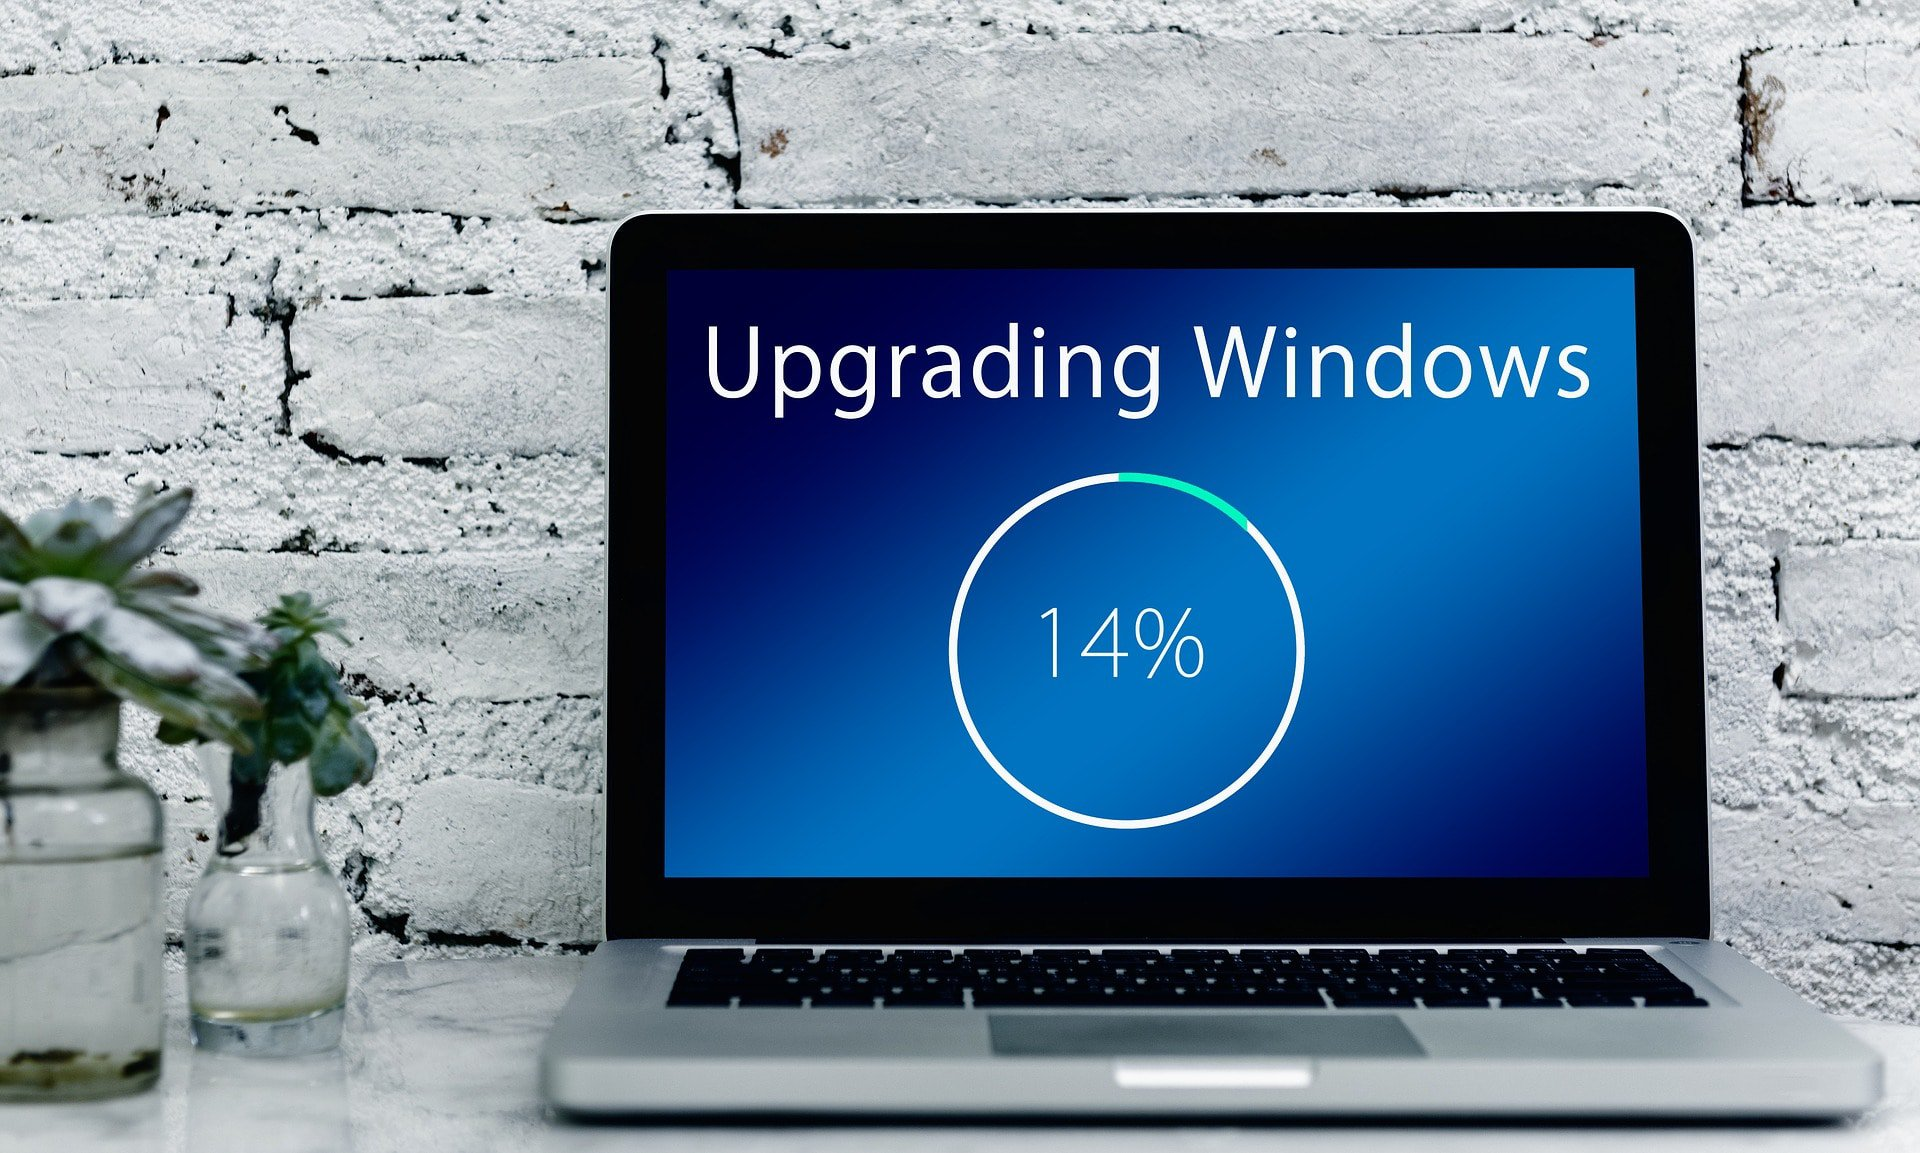 Windowsupgrade